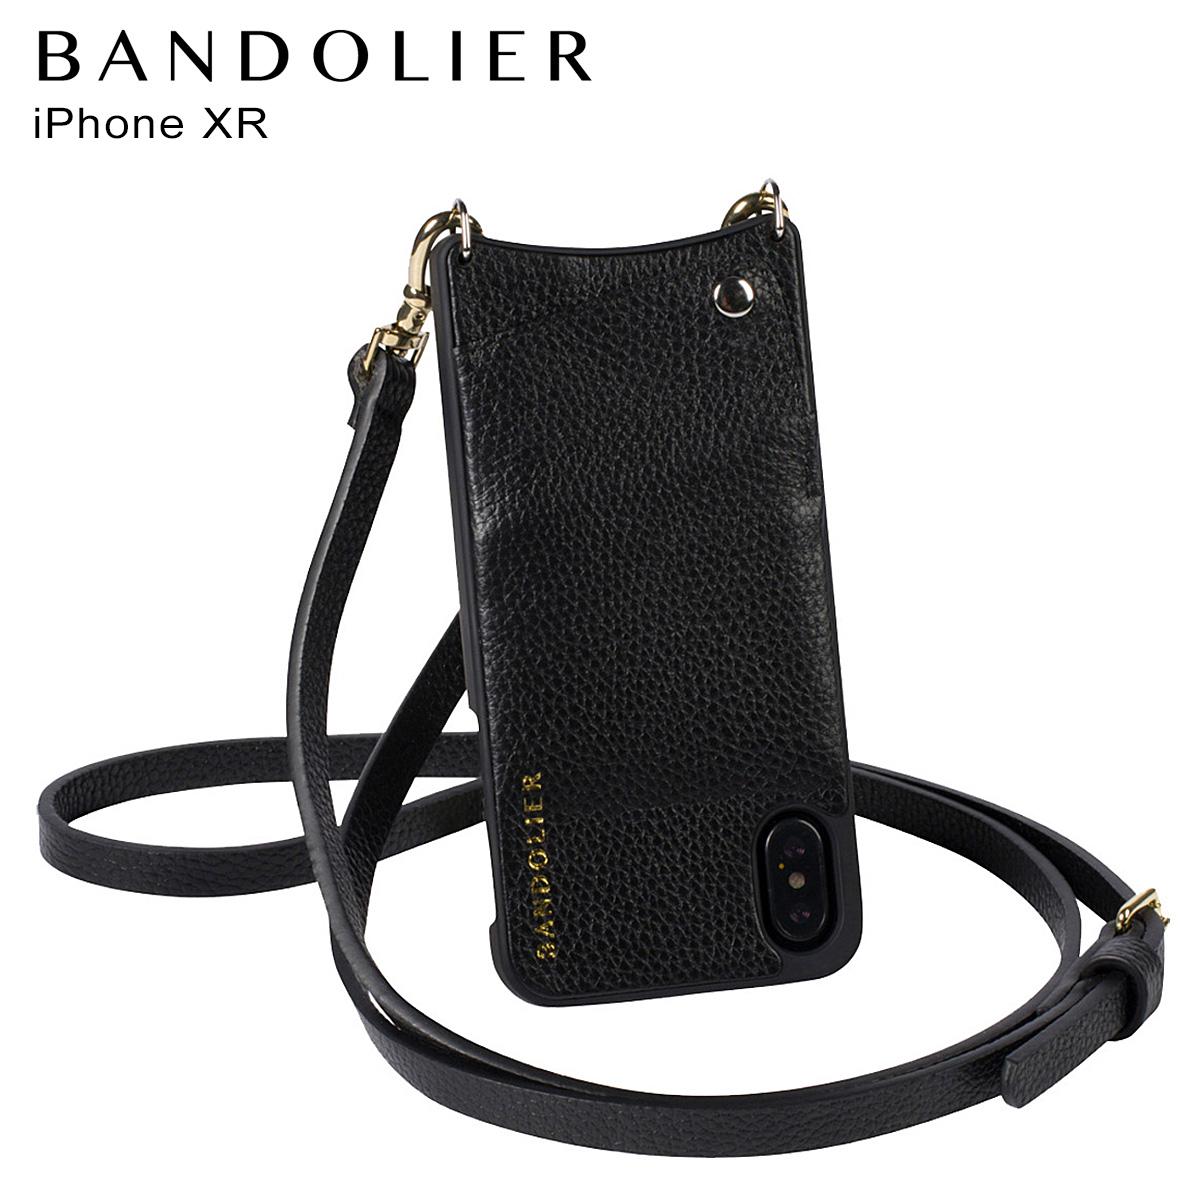 BANDOLIER iPhone XR EMMA GOLD バンドリヤー ケース ショルダー スマホ アイフォン レザー メンズ レディース ブラック 10EMM1001